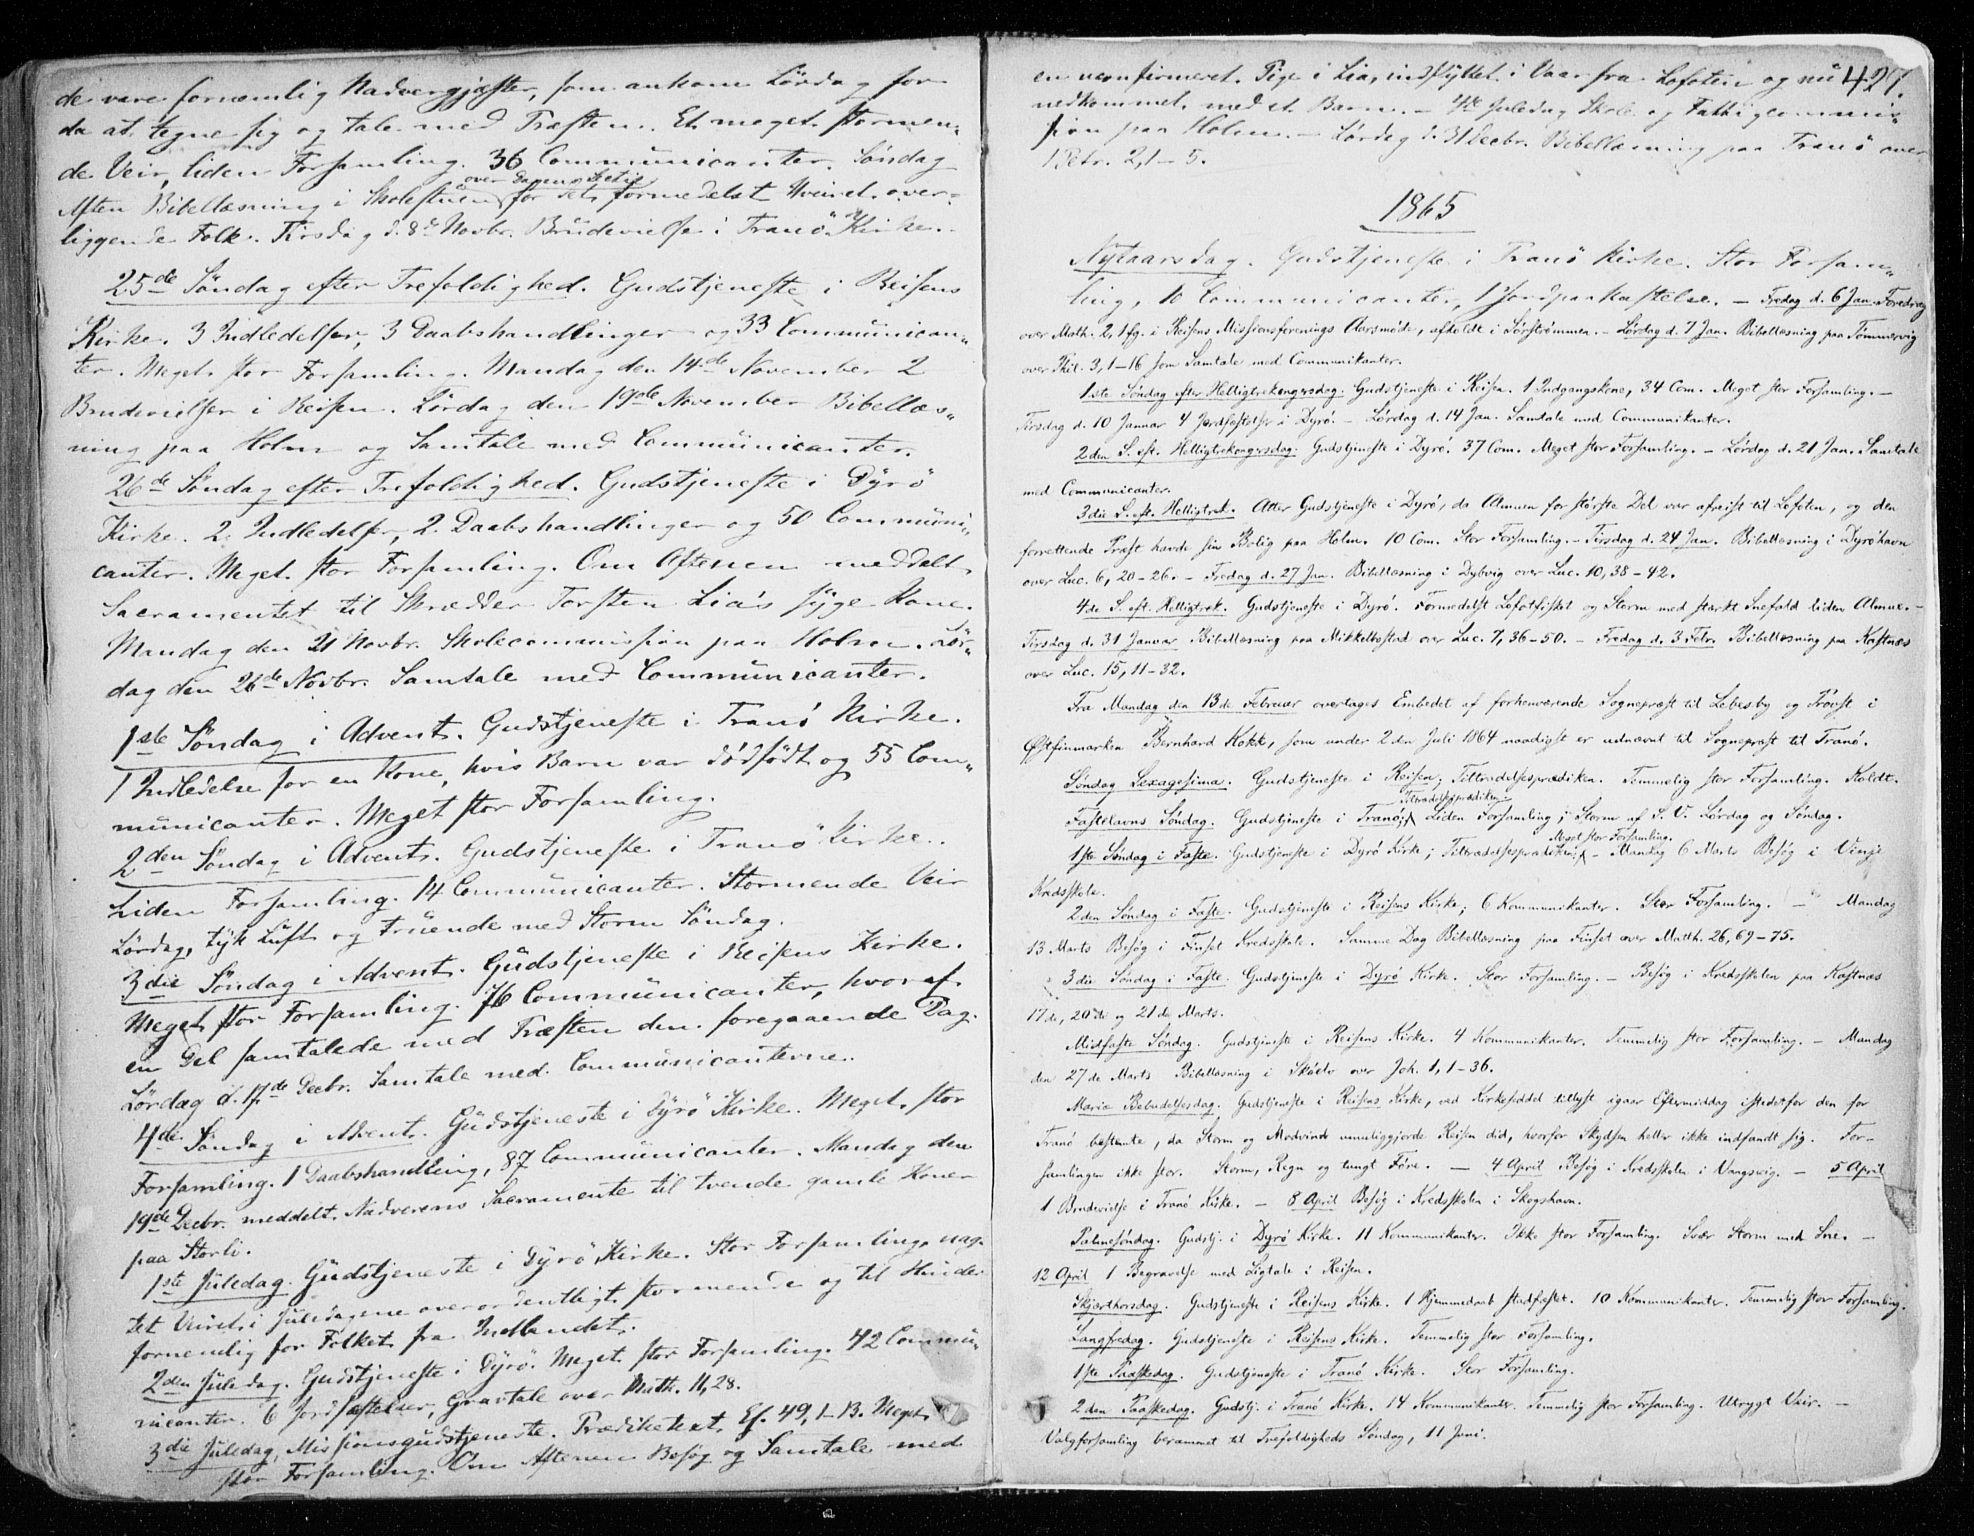 SATØ, Tranøy sokneprestkontor, I/Ia/Iaa/L0007kirke: Ministerialbok nr. 7, 1856-1866, s. 427